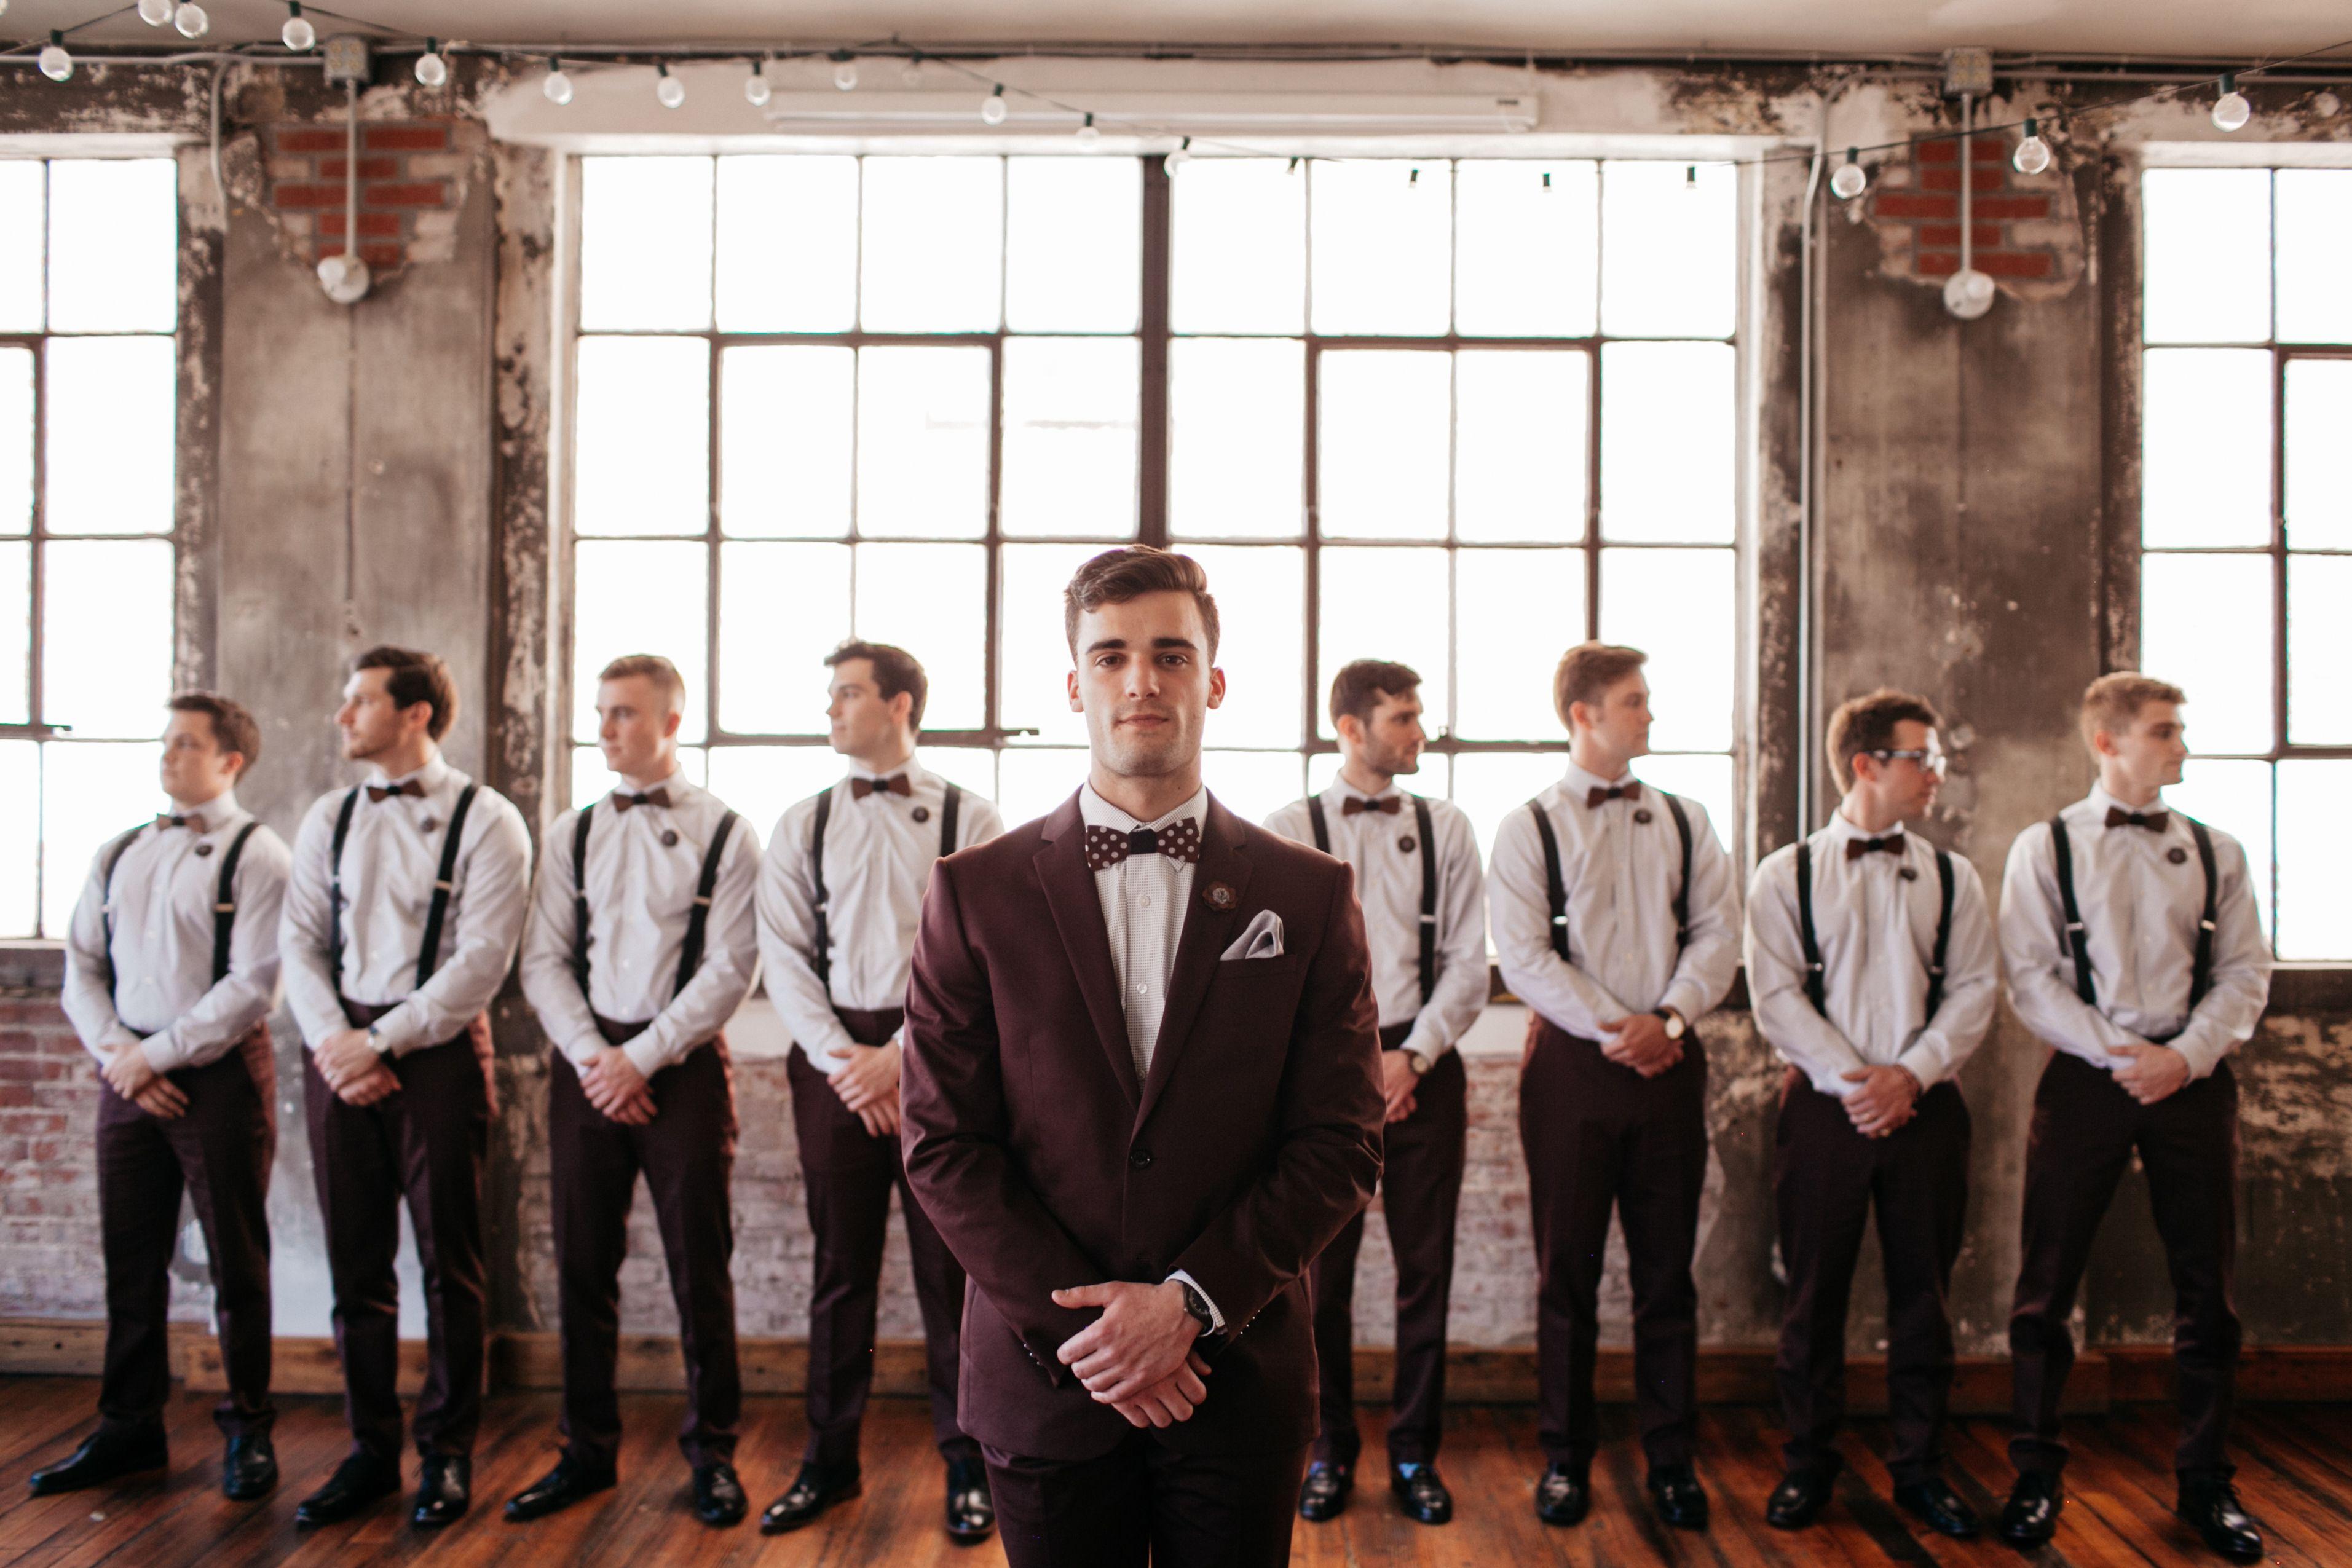 21++ Fall wedding groomsmen attire inspirations